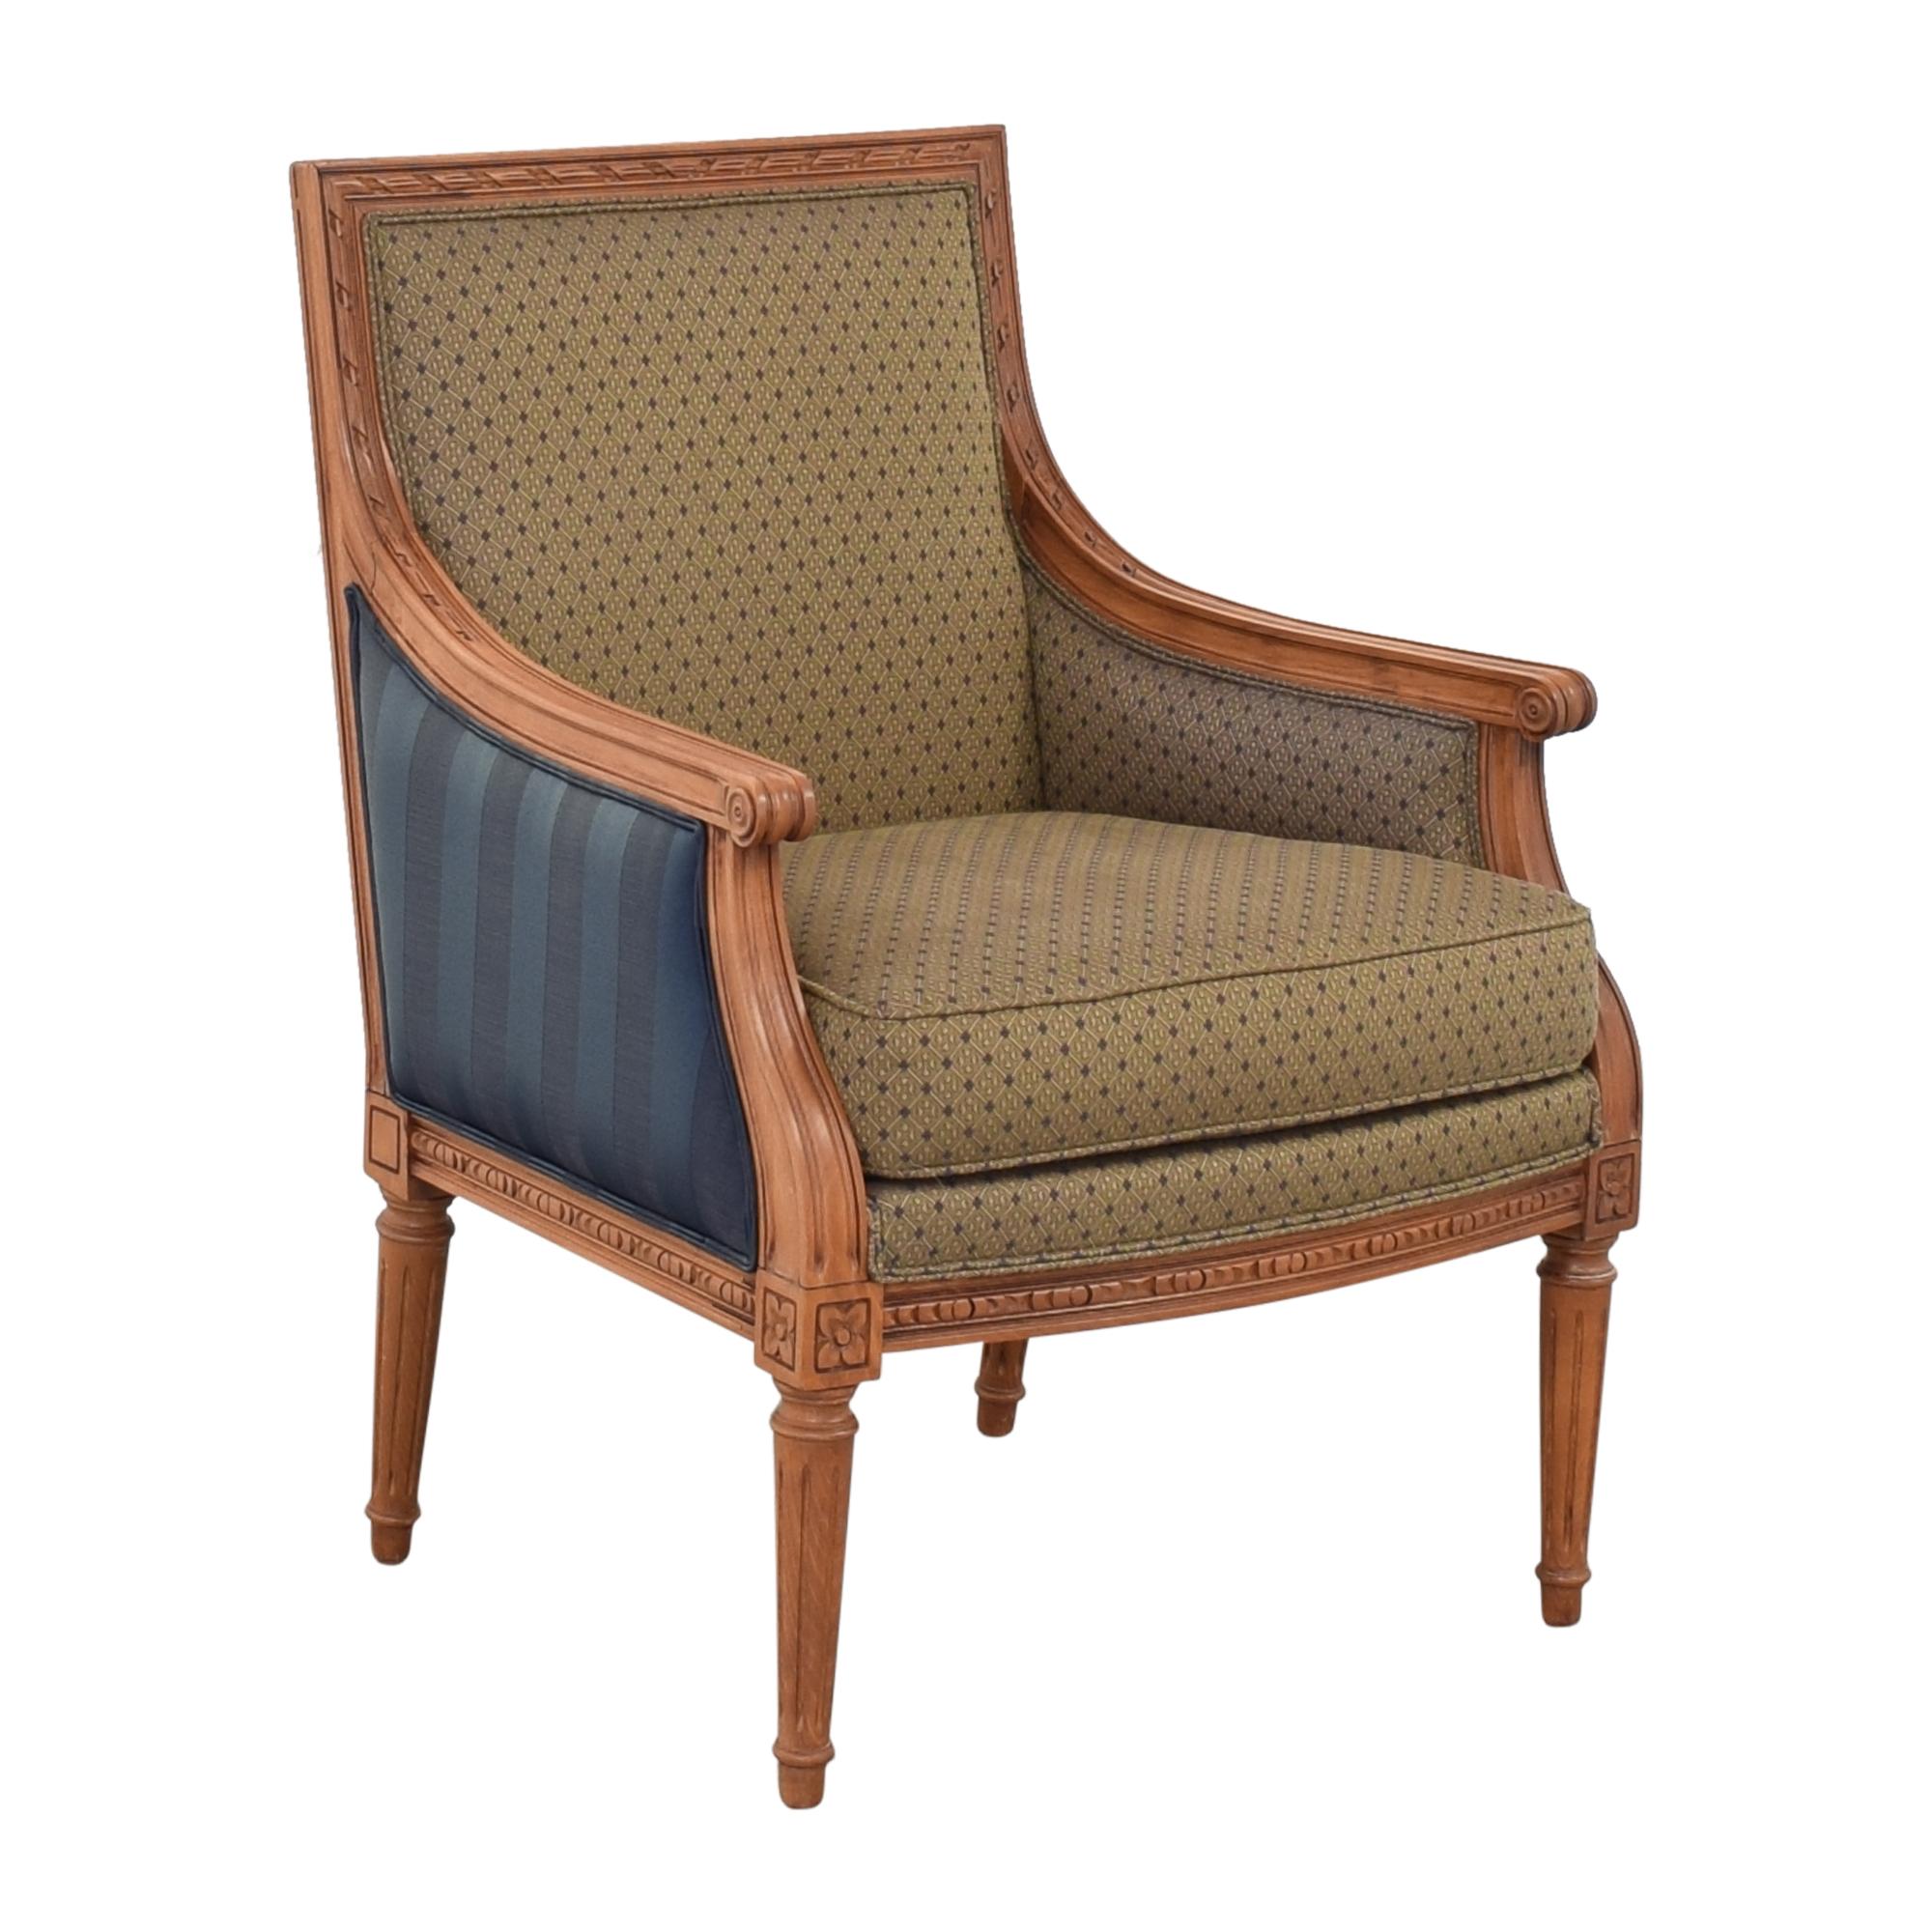 Ethan Allen Ethan Allen Gisele Chair for sale